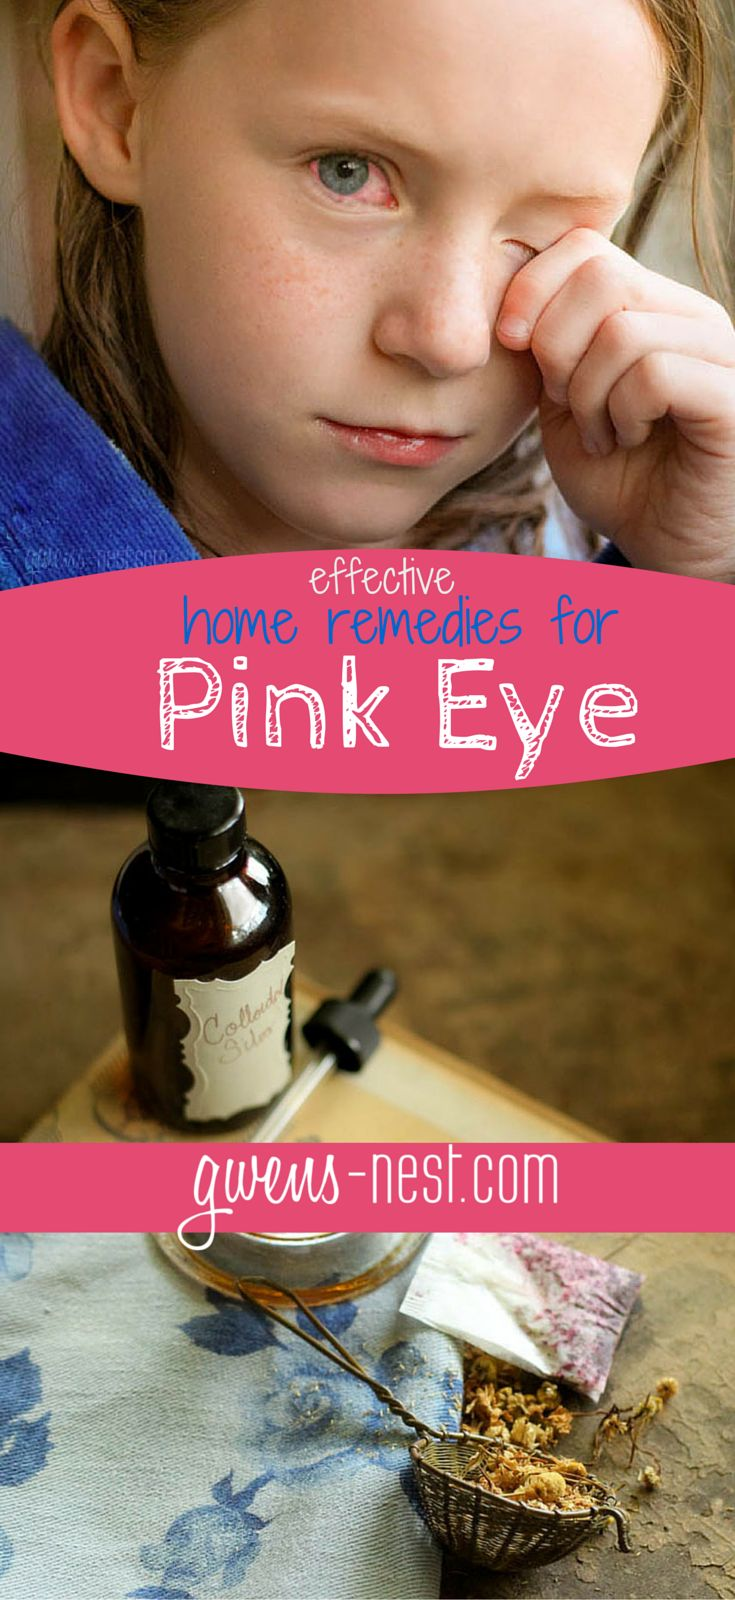 Home Remedy For Pink Eye  Pinkeye Remedies, Pink Eye Home -7578